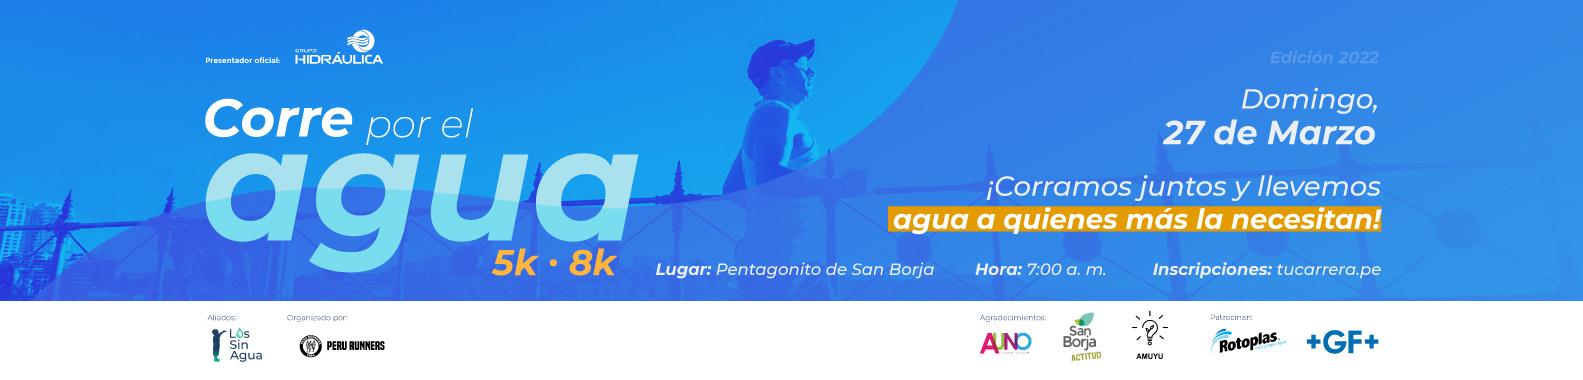 Tour Rojiblanco